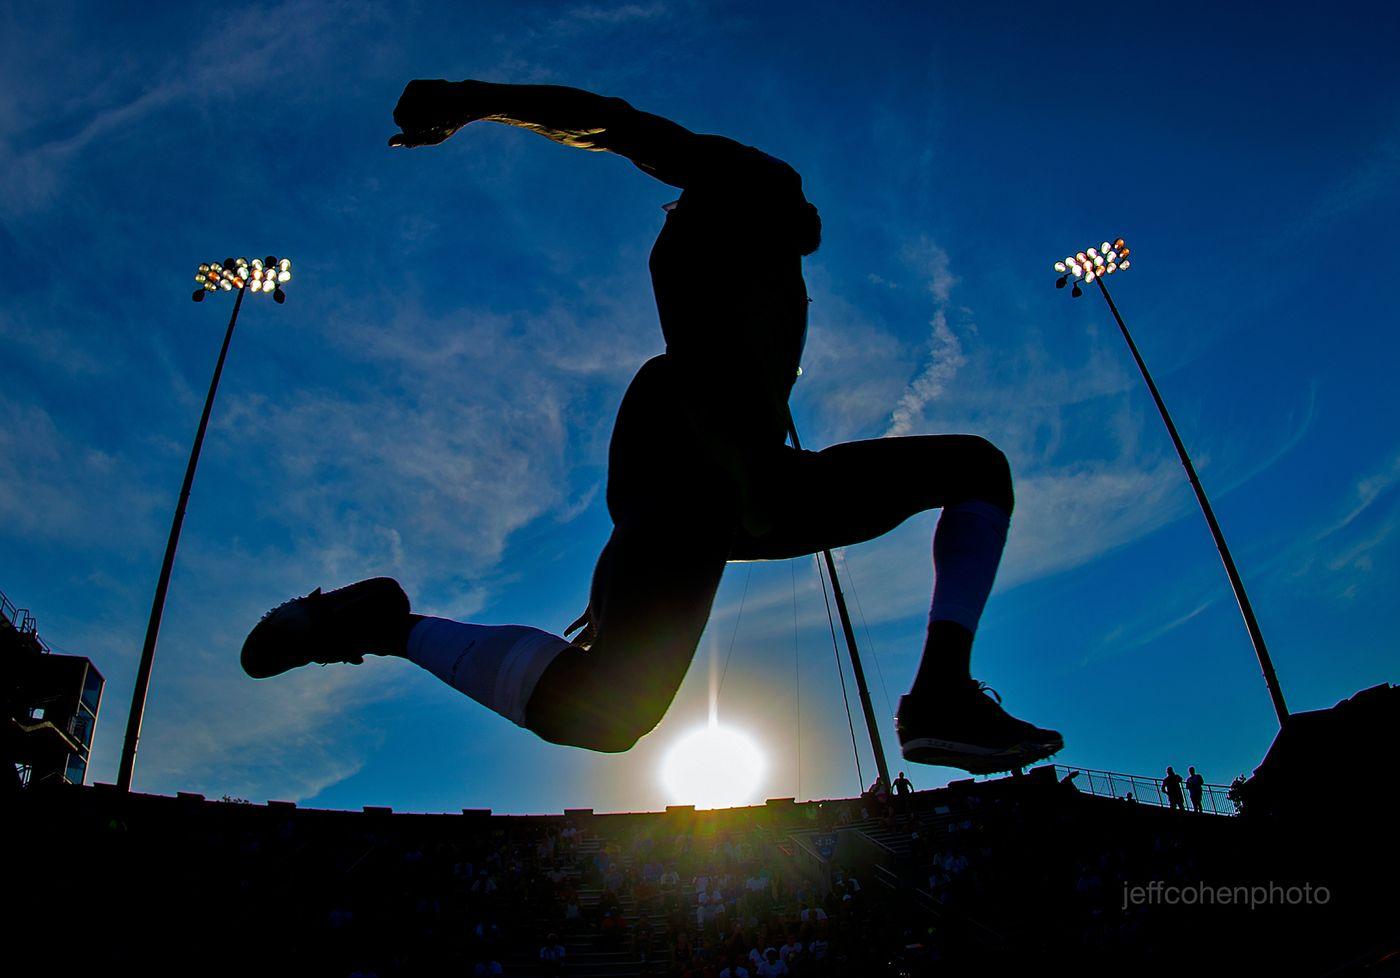 2019-USATF-Outdoor-Champs-day-2-claye-tjm--7173---jeff-cohen-photo--web.jpg